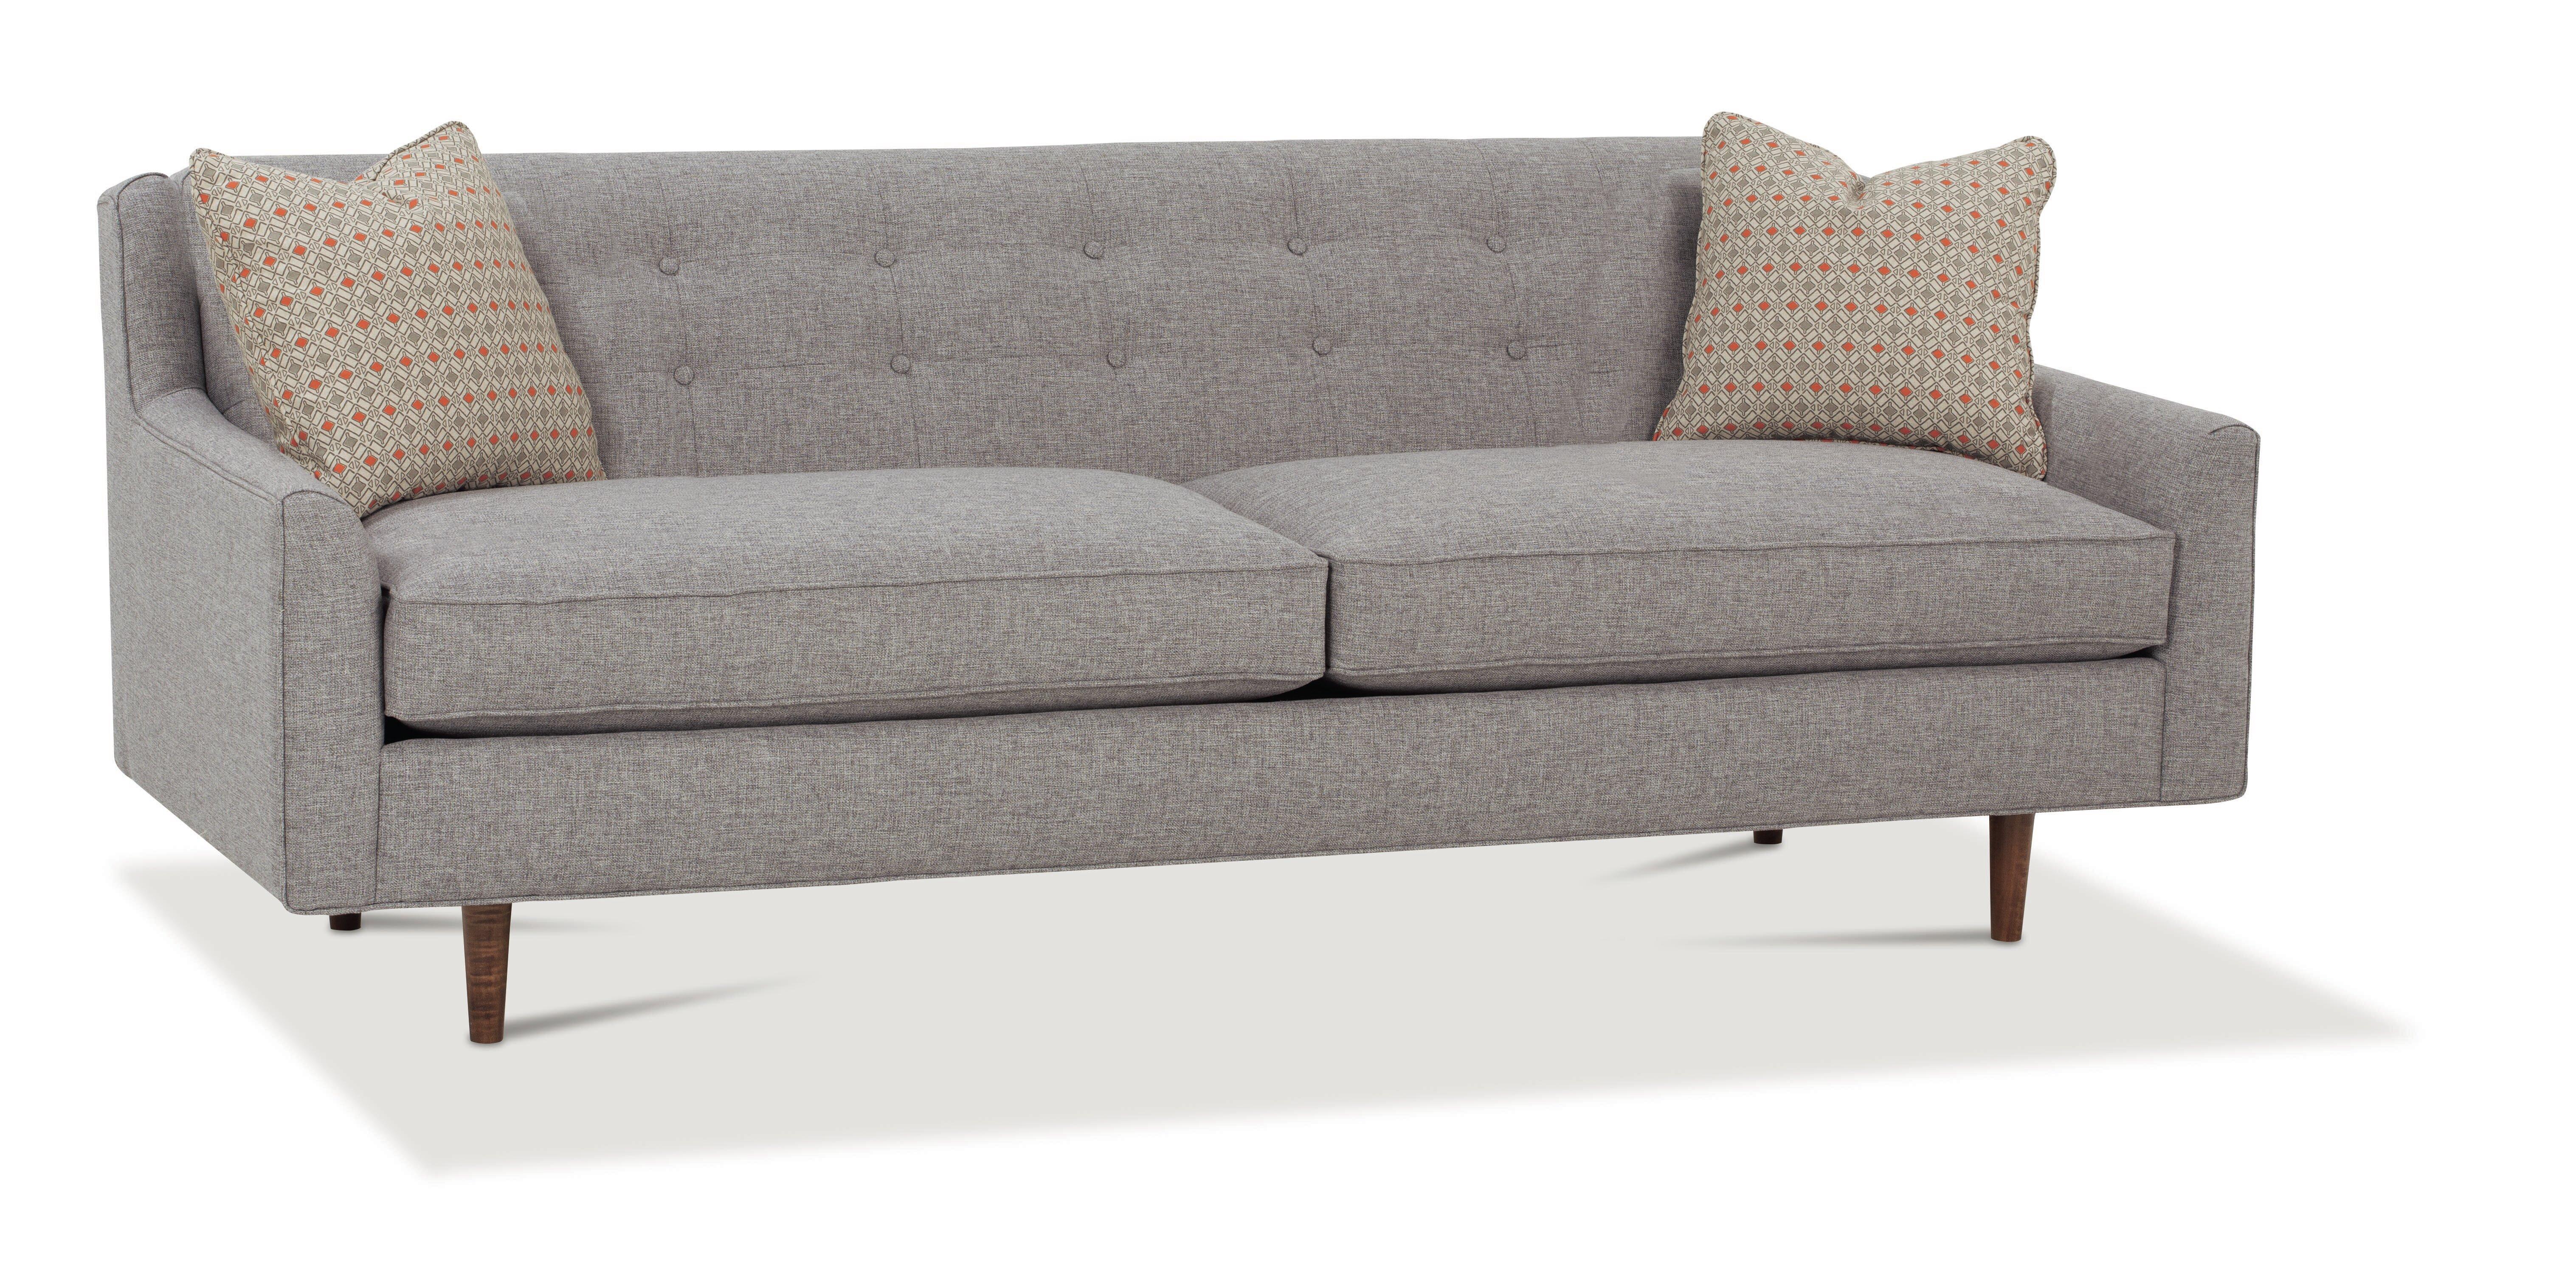 Superbe Rowe Furniture | Wayfair